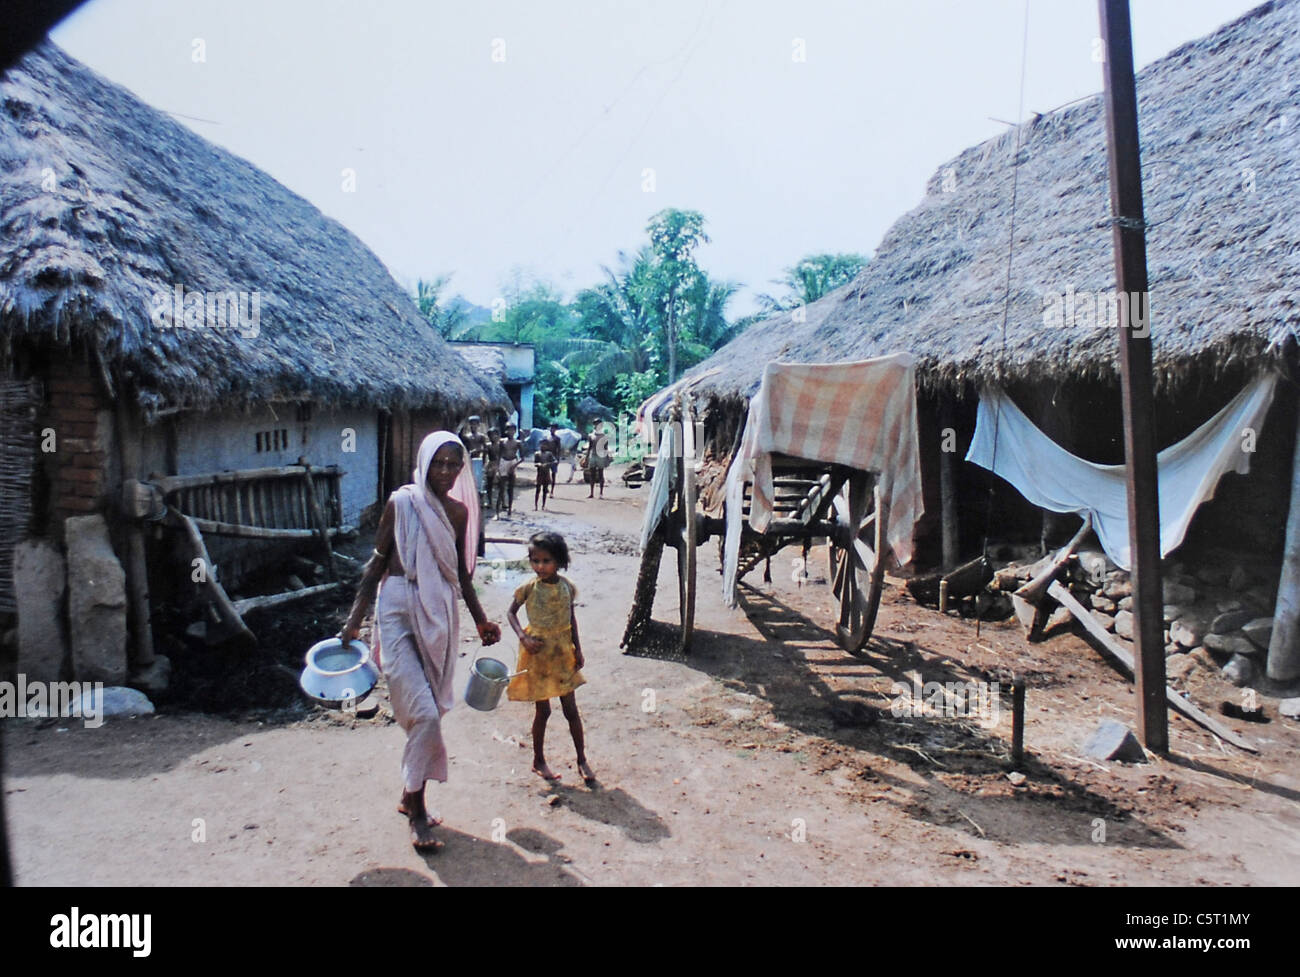 Rural Orissa Stock Photos & Rural Orissa Stock Images - Page